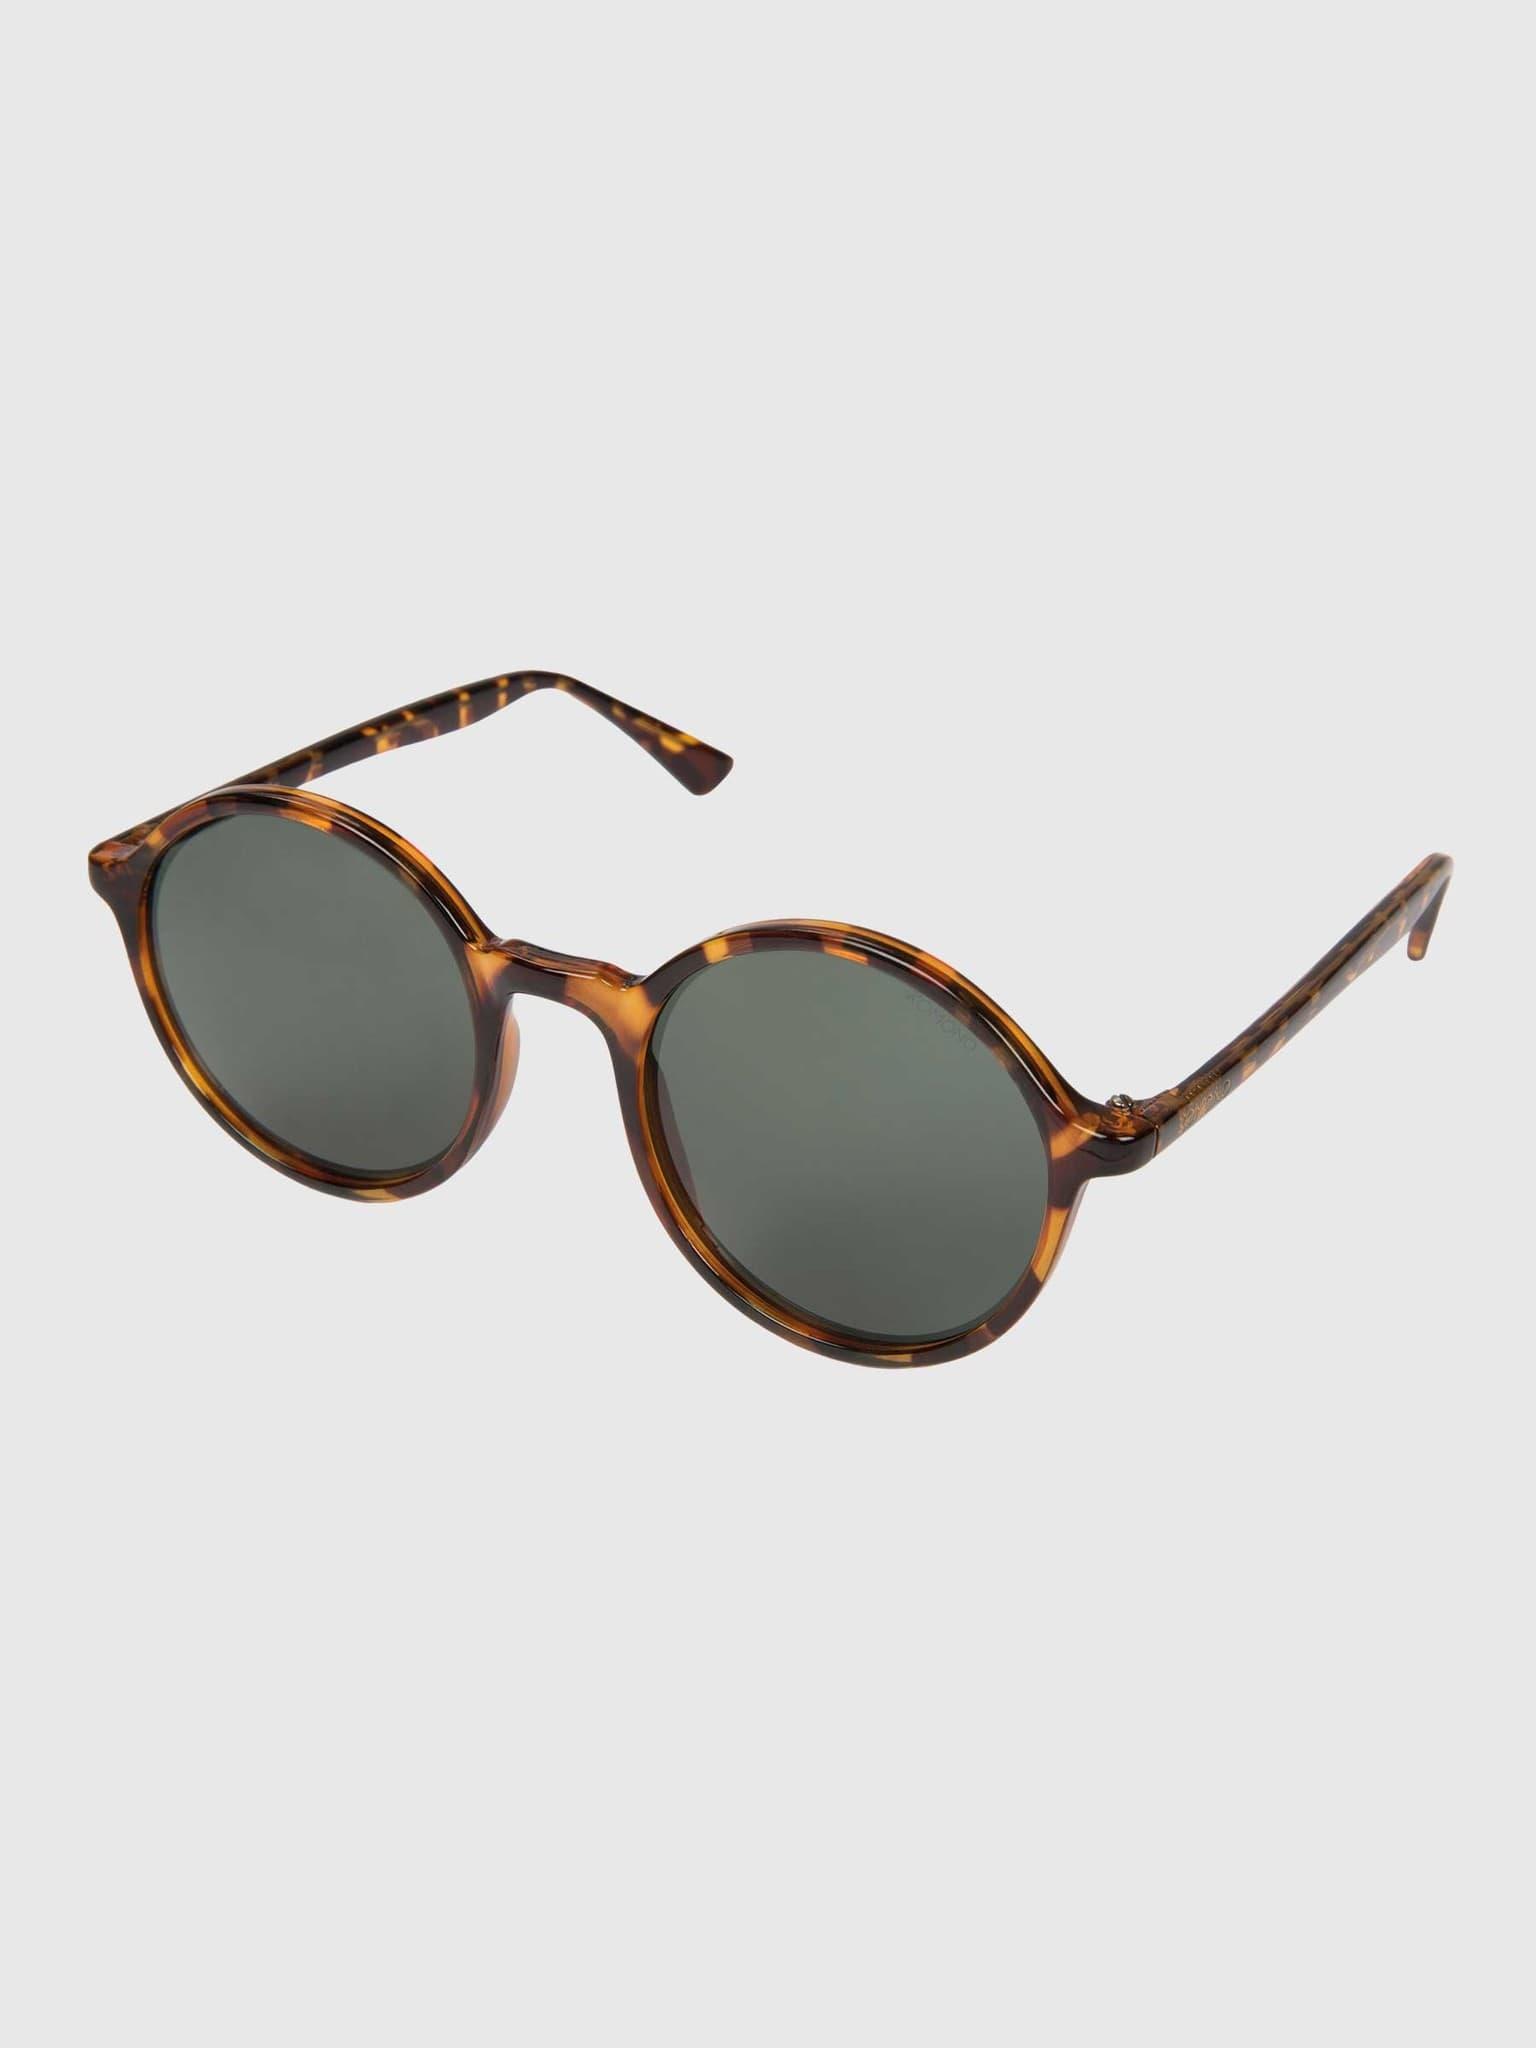 Madison Sunglasses Tortoise Kom-S3250